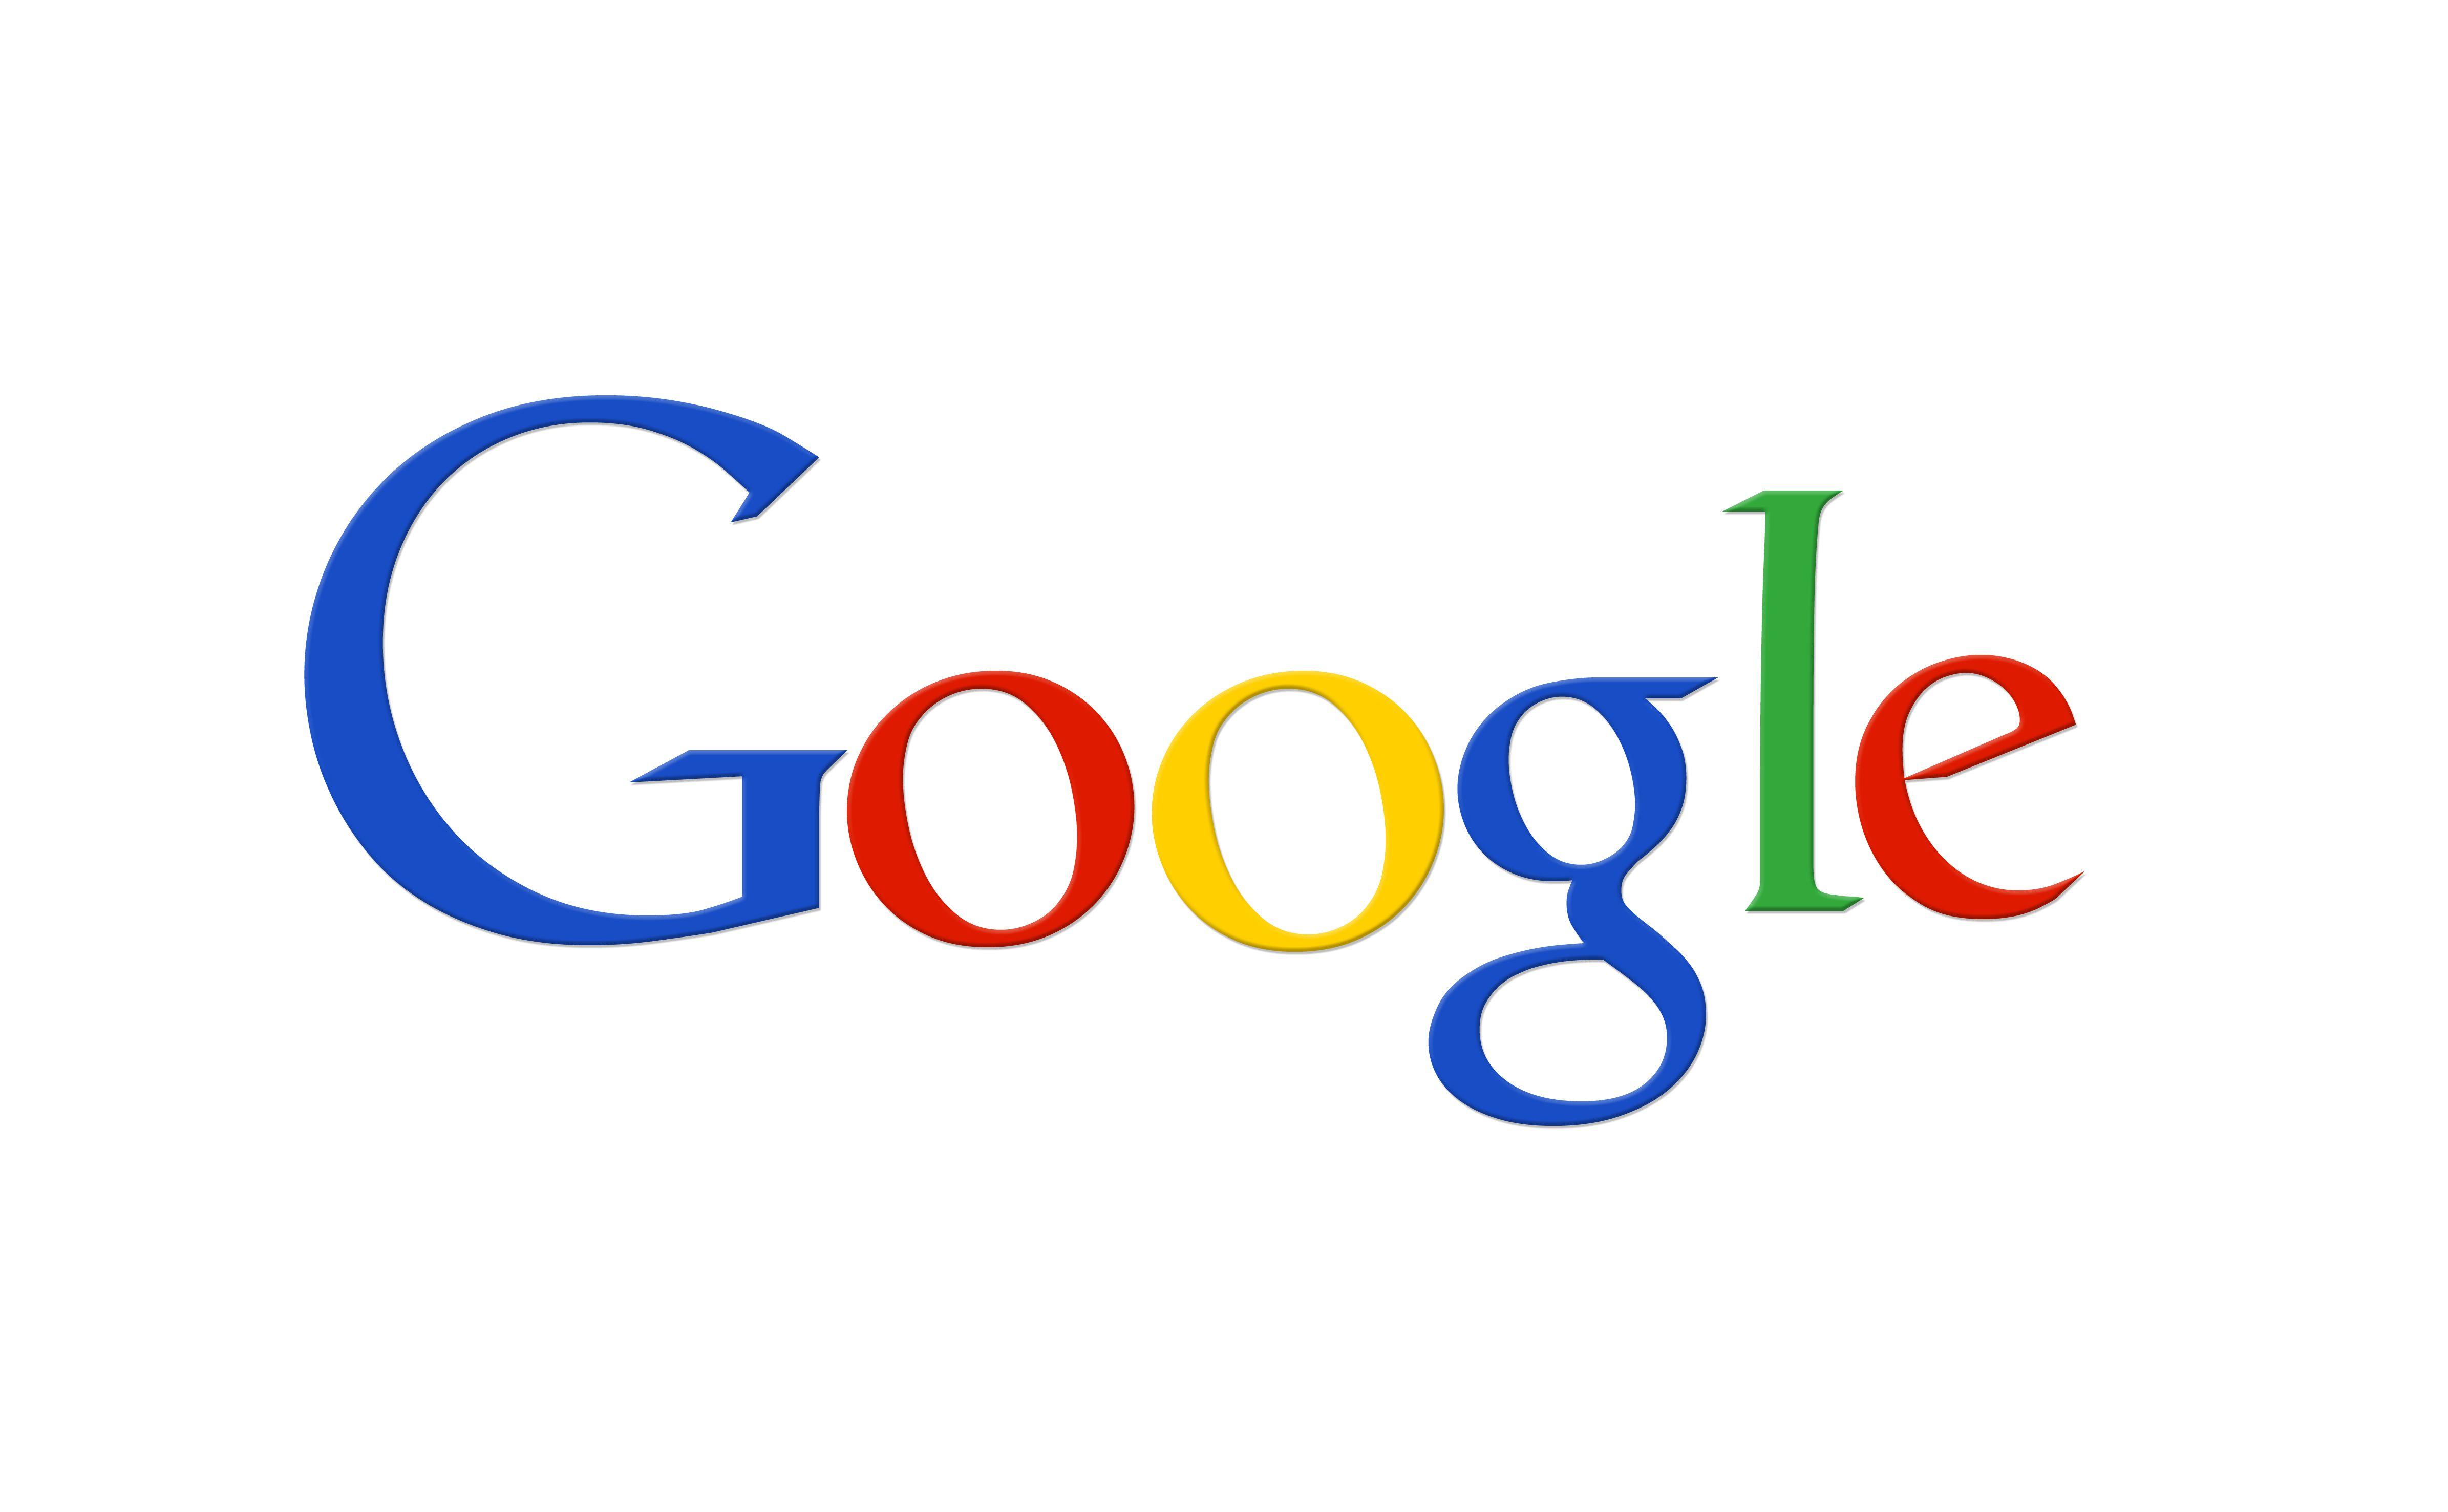 Корпорация Google объявила о закрытии фотосервиса Picasa